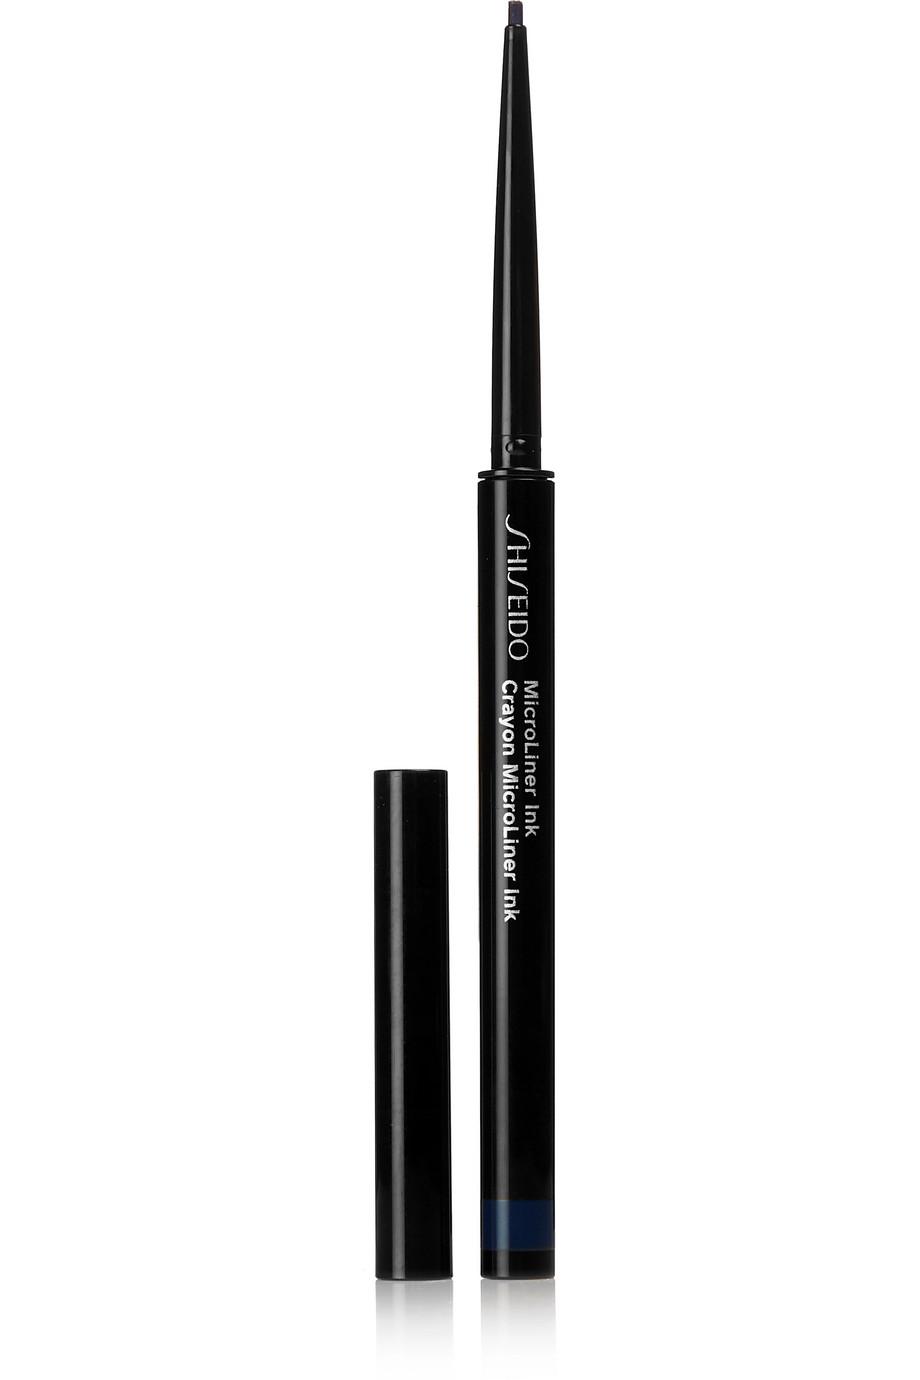 Shiseido MicroLiner Ink – Navy 04 – Kajal